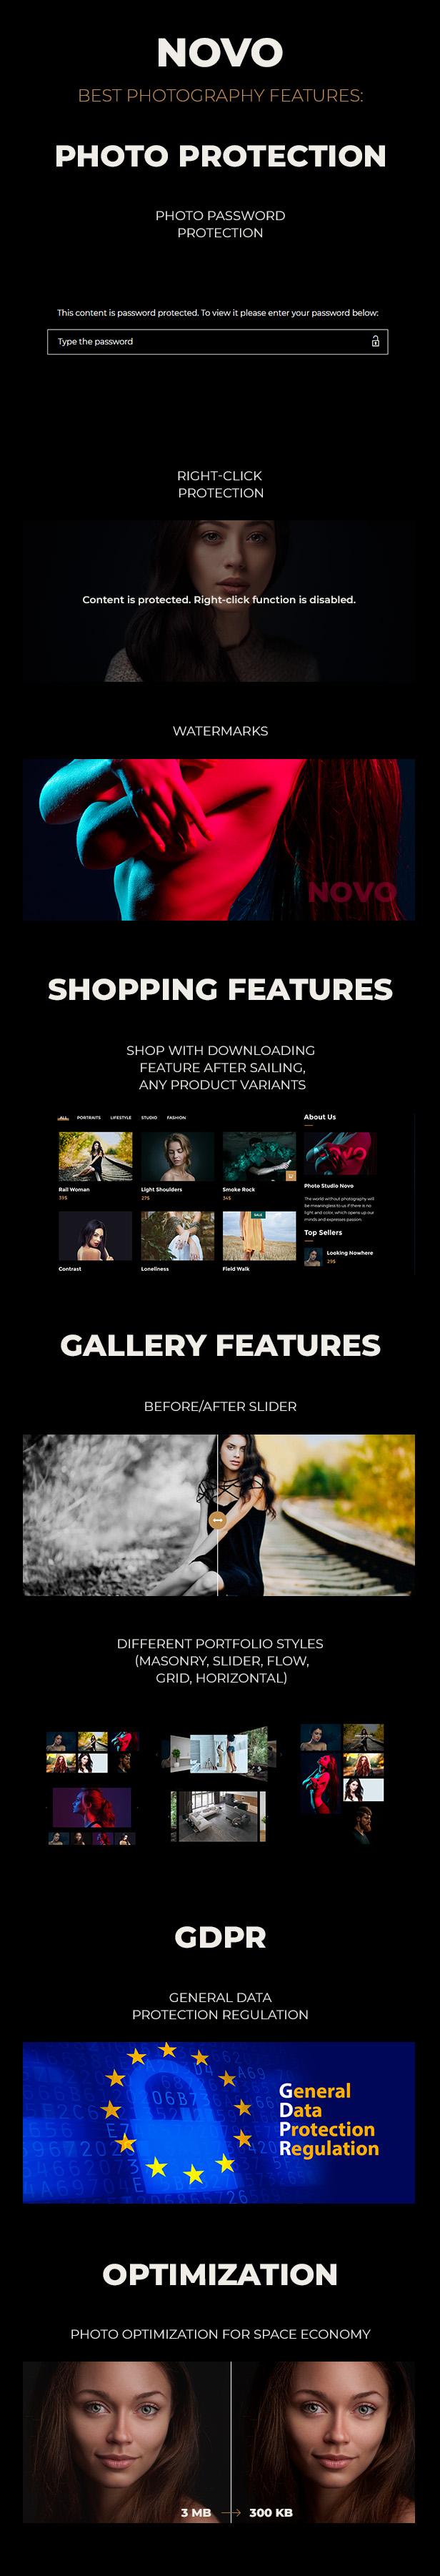 Novo - Photography - 5